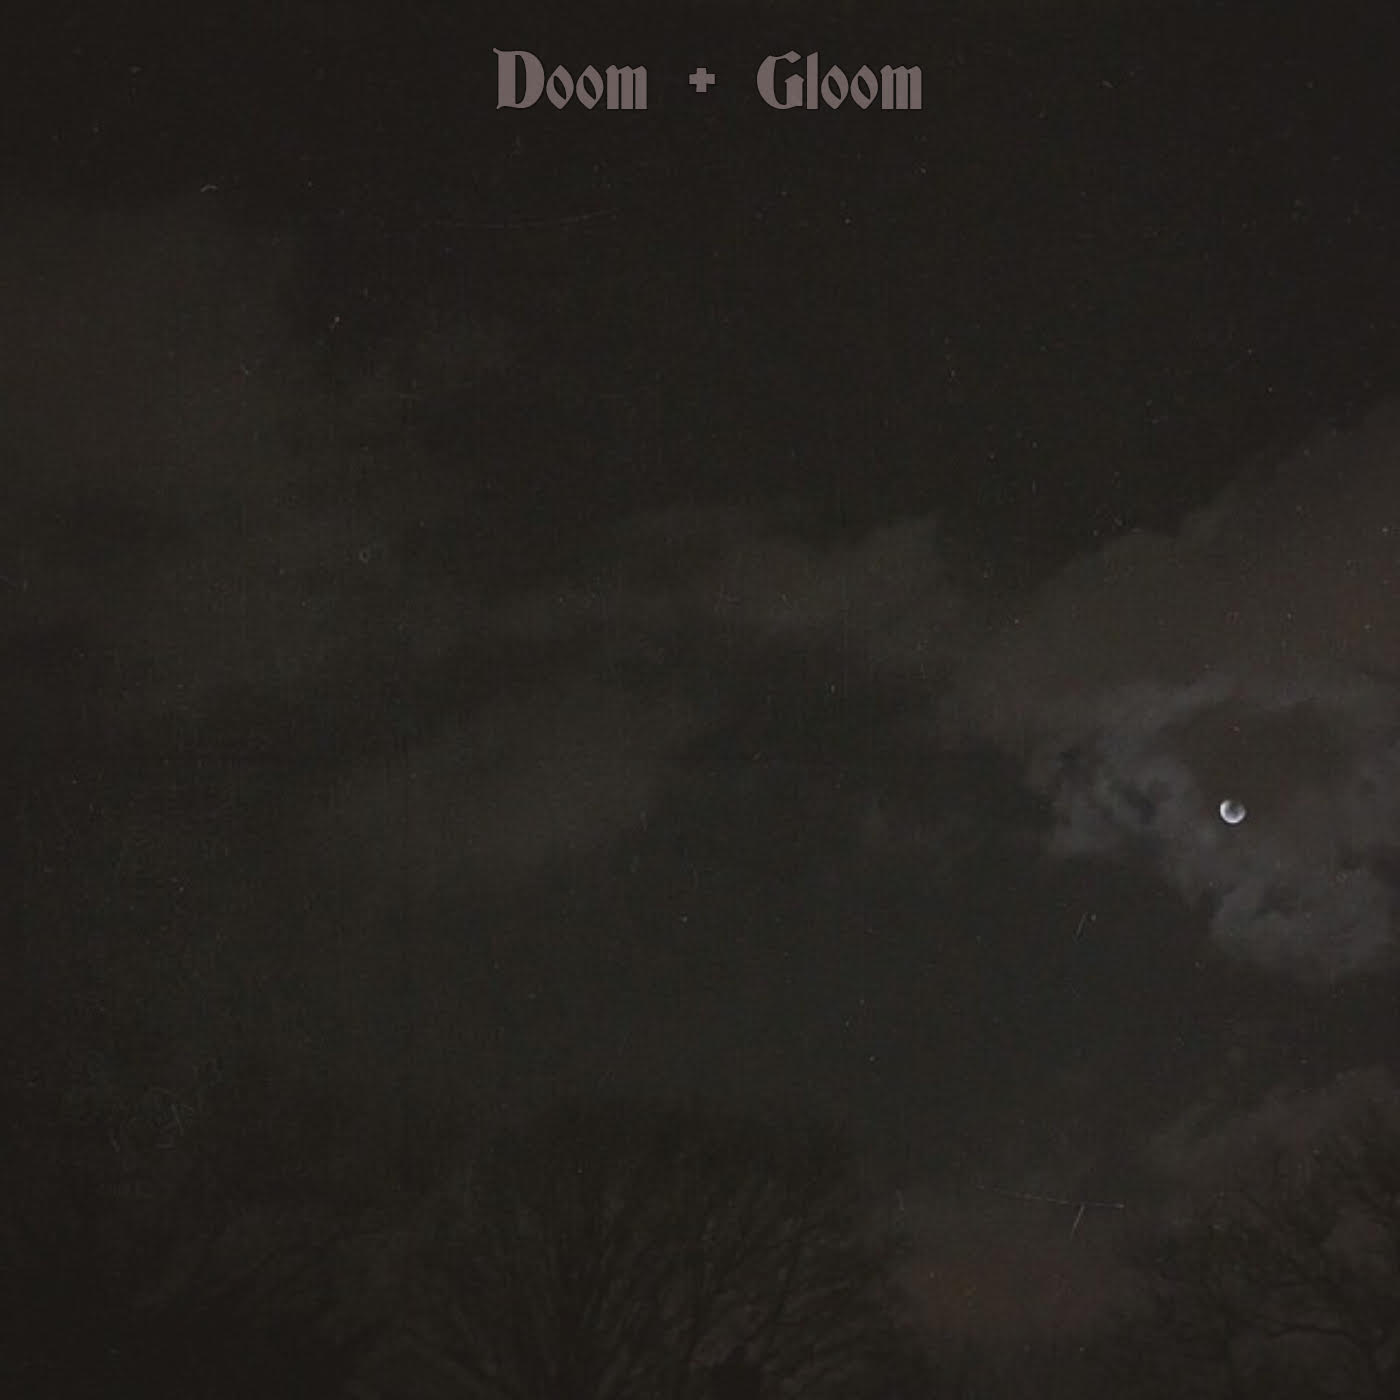 Fade to Black - Doom & Gloom